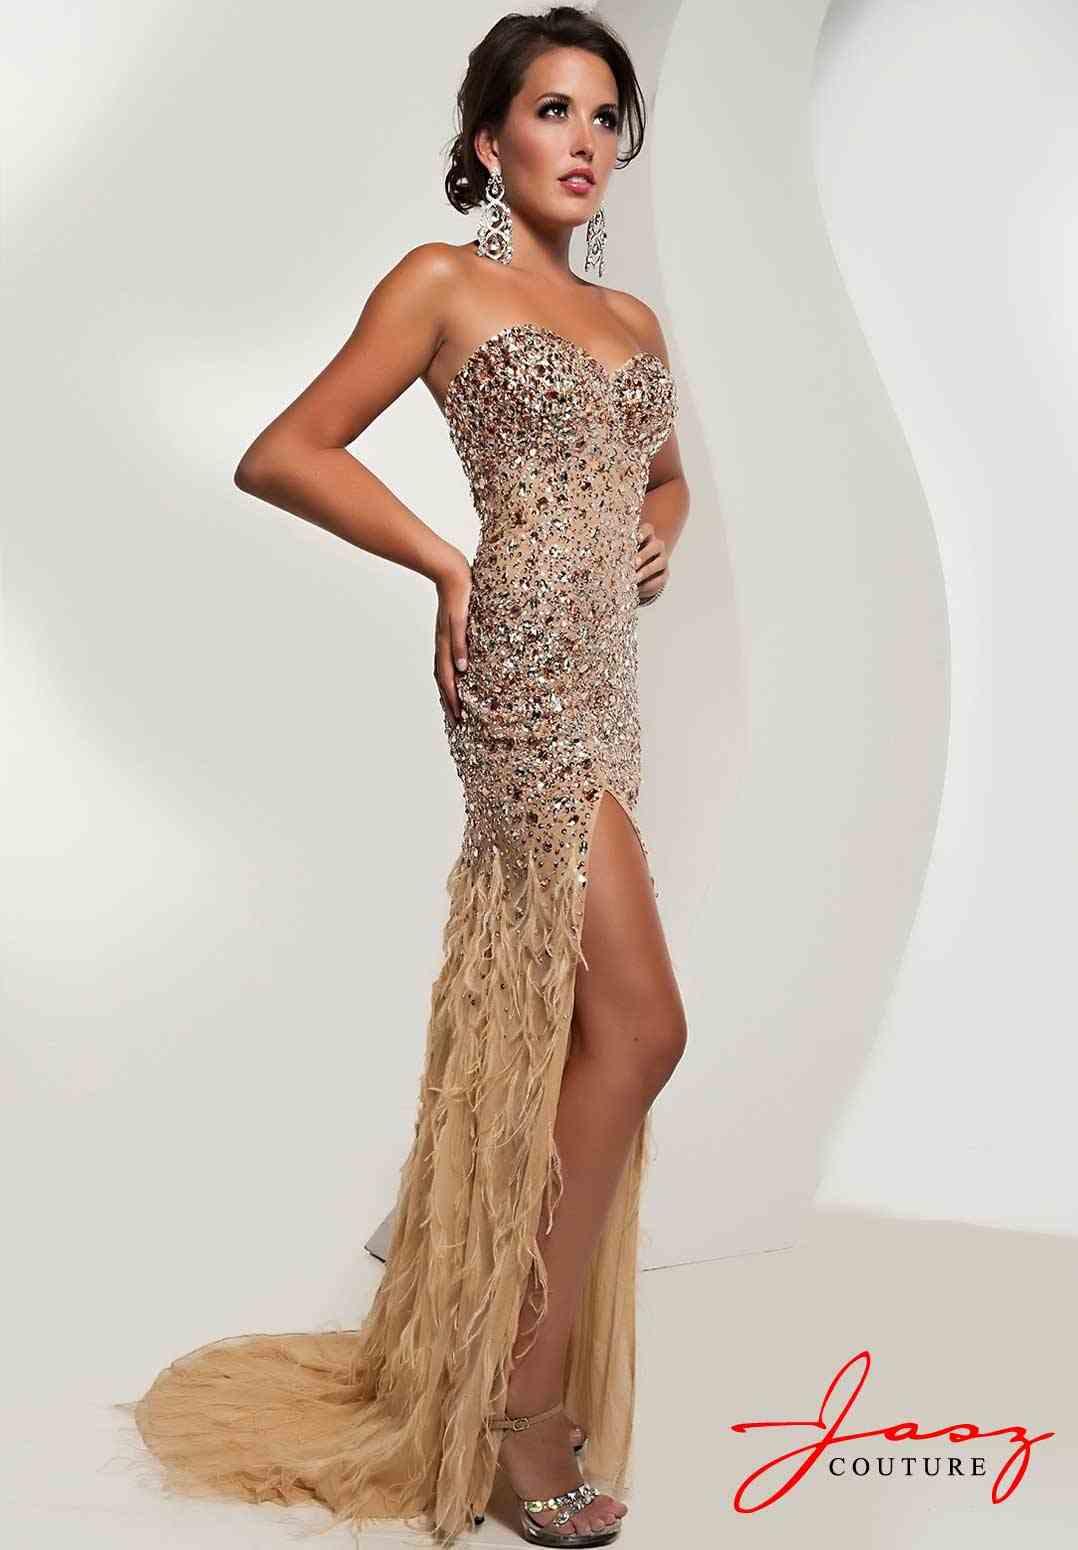 jasz 4826 Cheap Launched, jasz Strapless dress 2014 Hot Sales